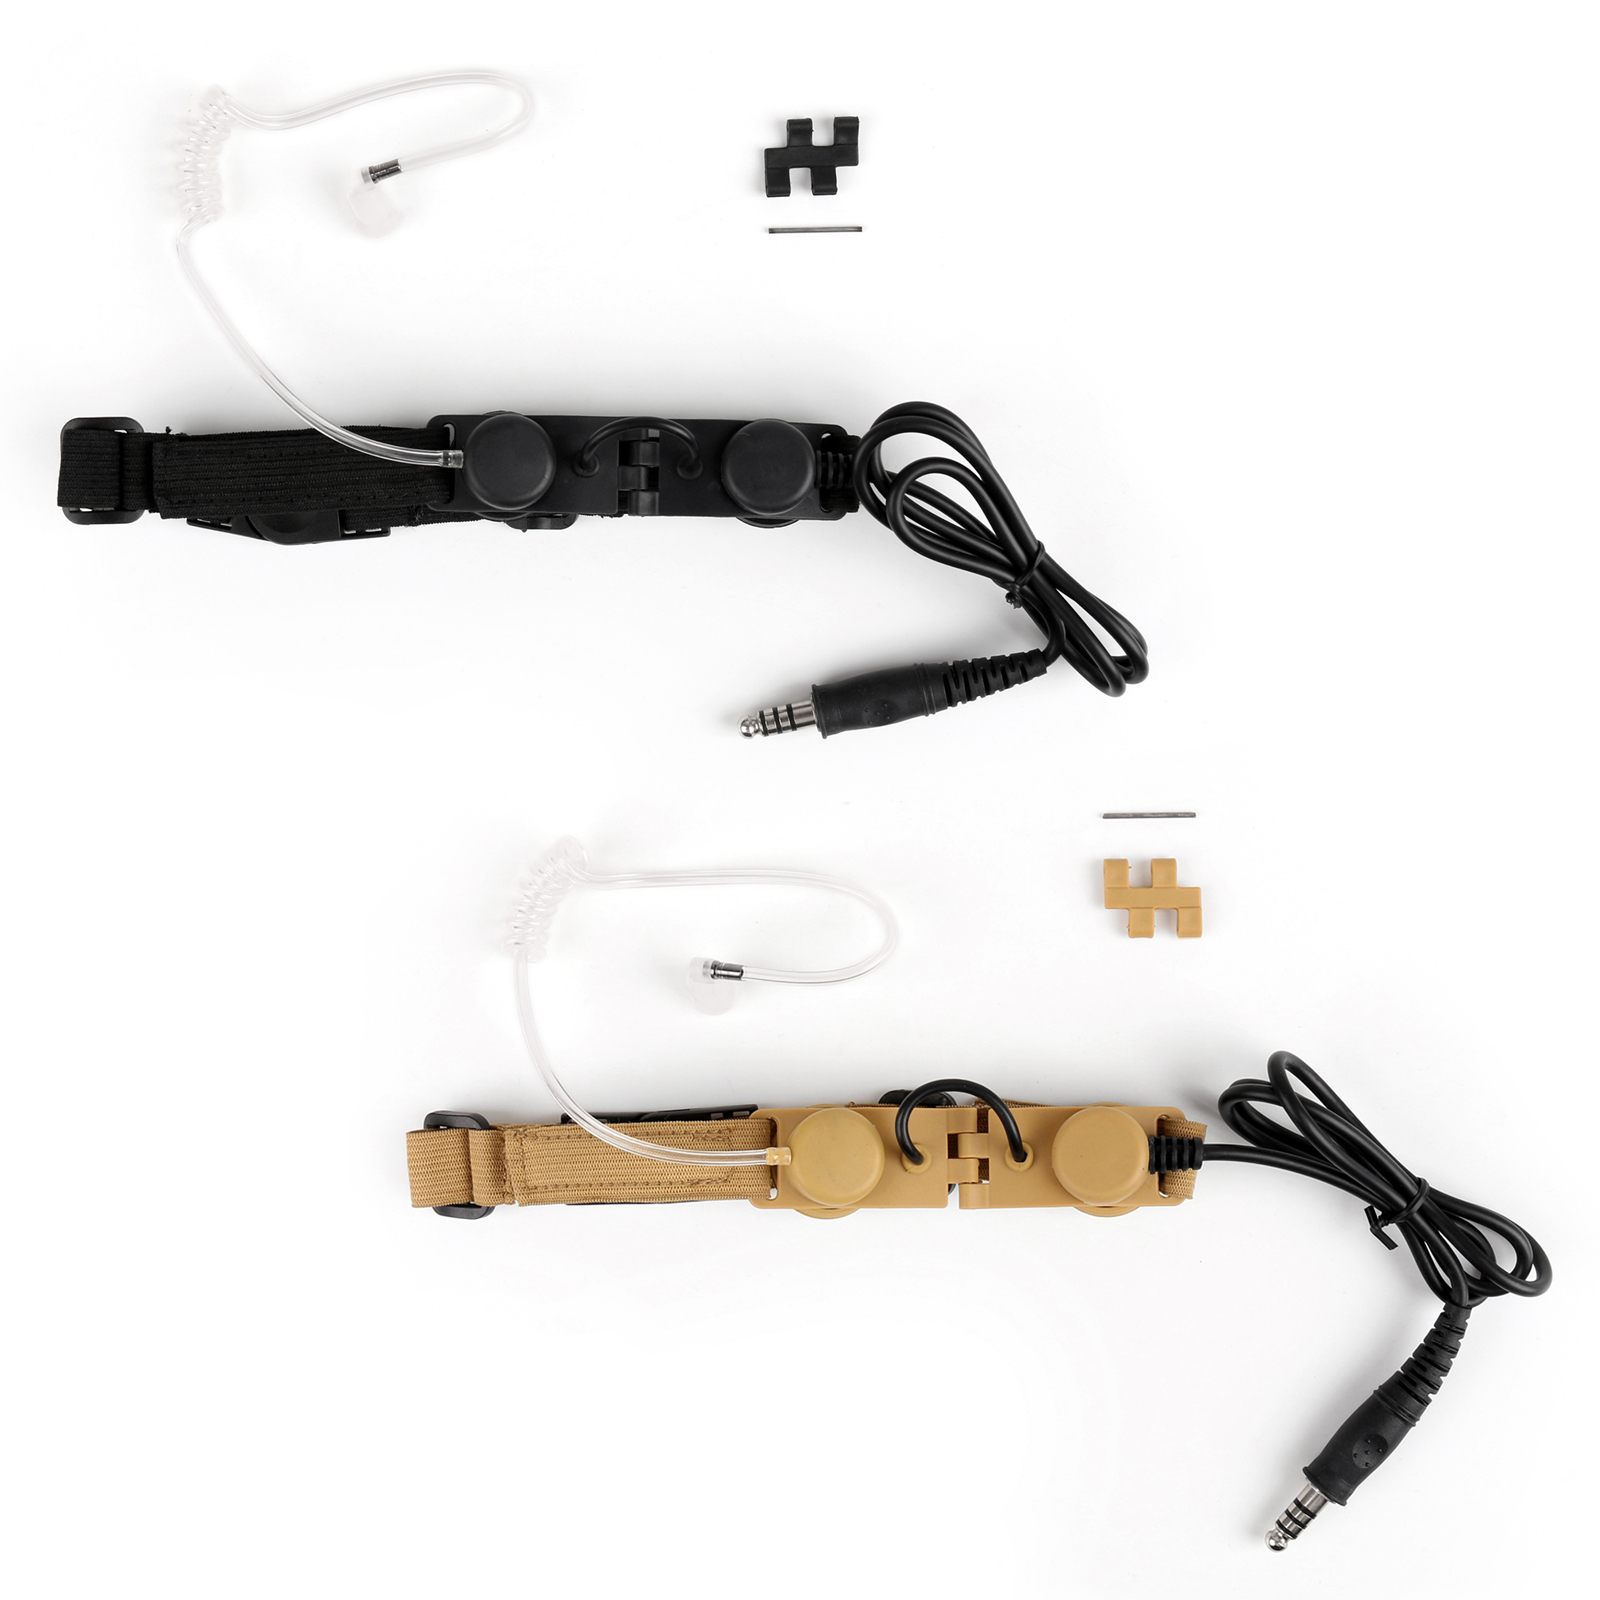 Artudatech Z-Tactical Throat Mic Adjustable Neck Strap Walkie Talkie Headset Headphone